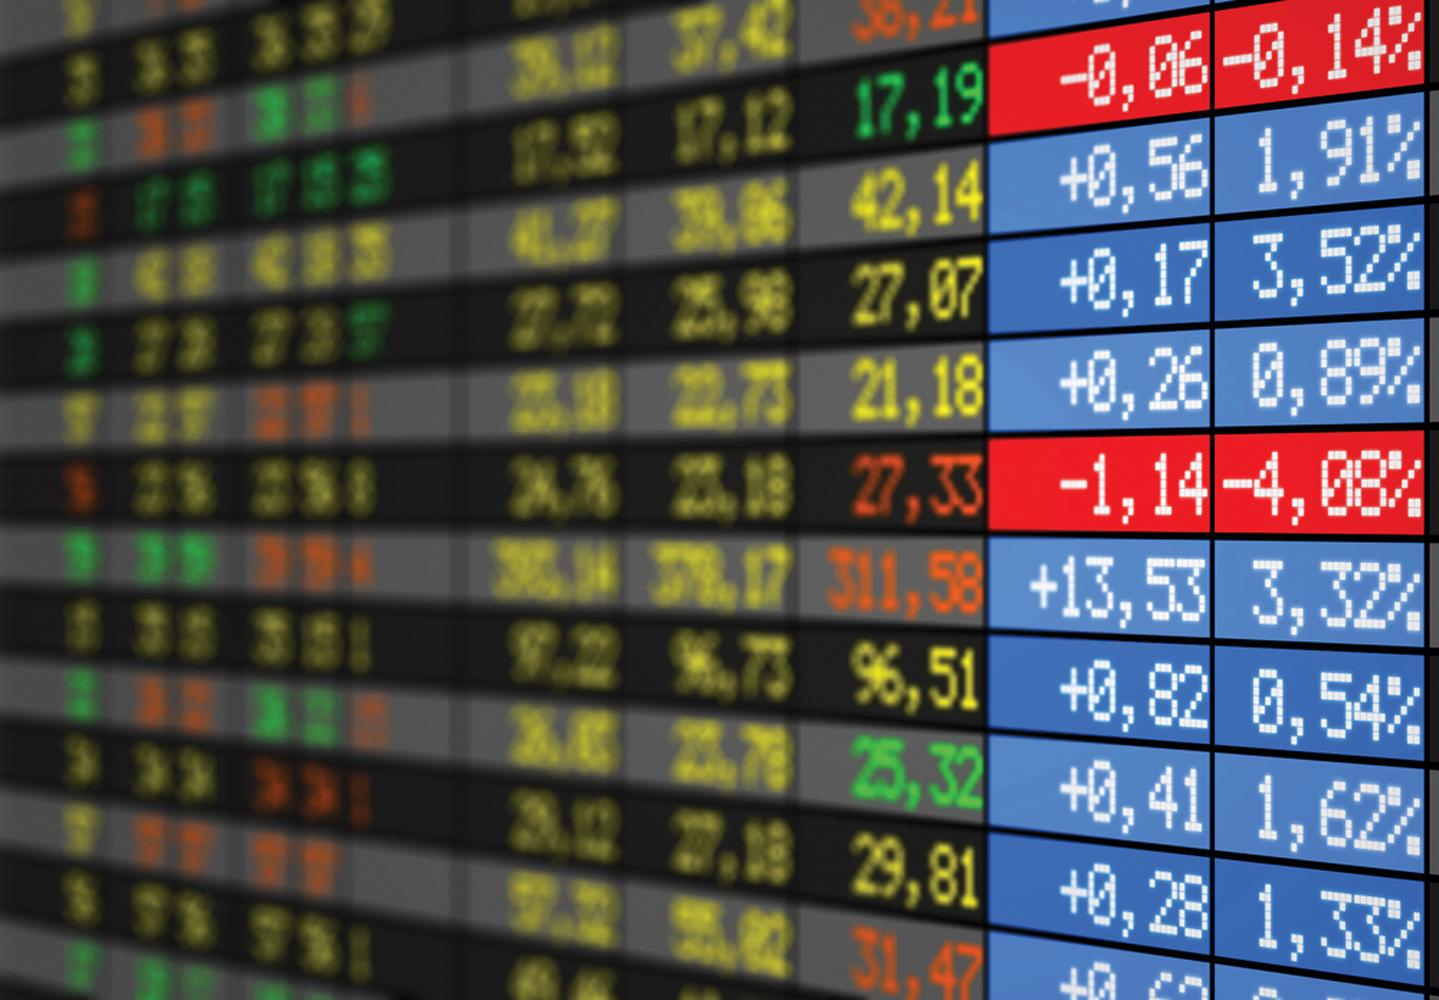 FTSE ماليزيا وكوالالمبور يهبط بنسبة 0.72 %